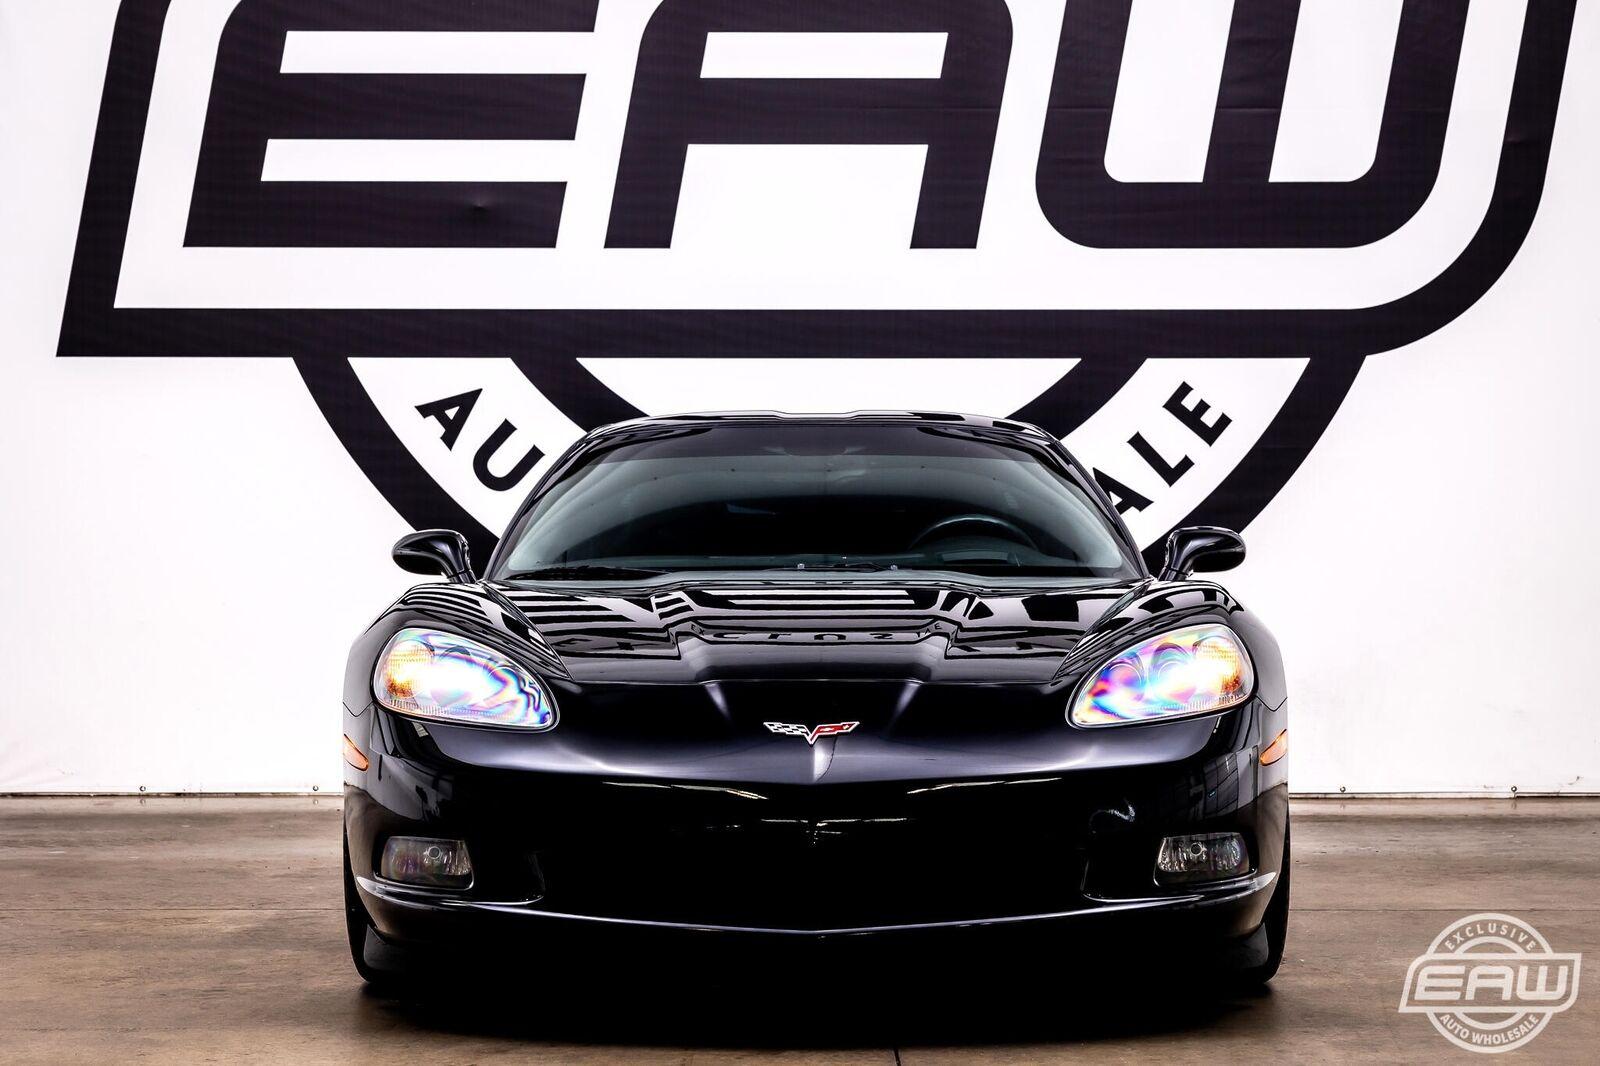 2007 Black Chevrolet Corvette Coupe  | C6 Corvette Photo 6